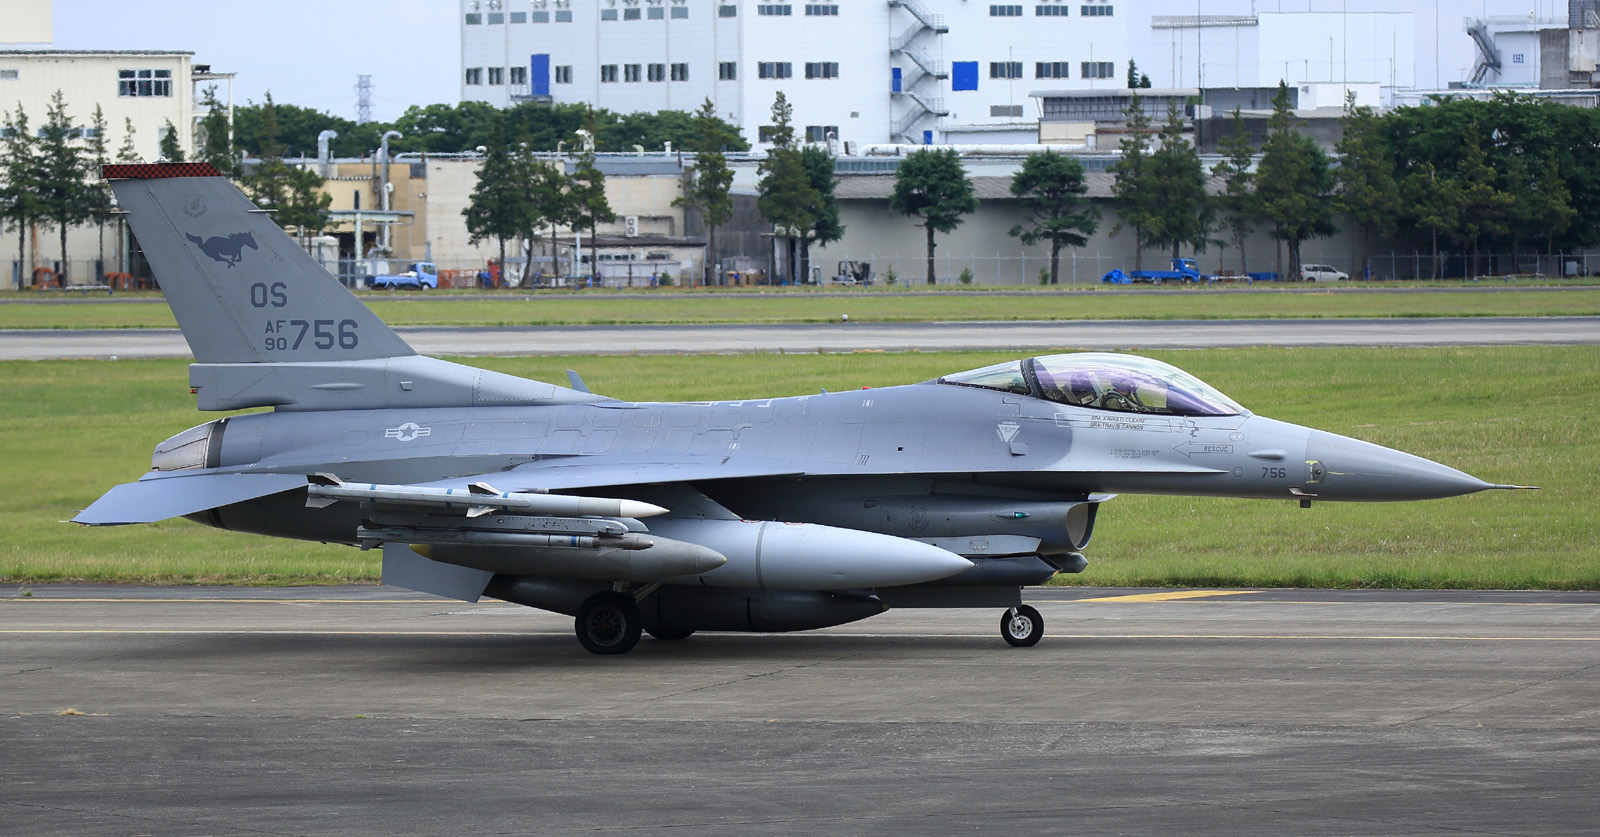 F16cm170601tk980